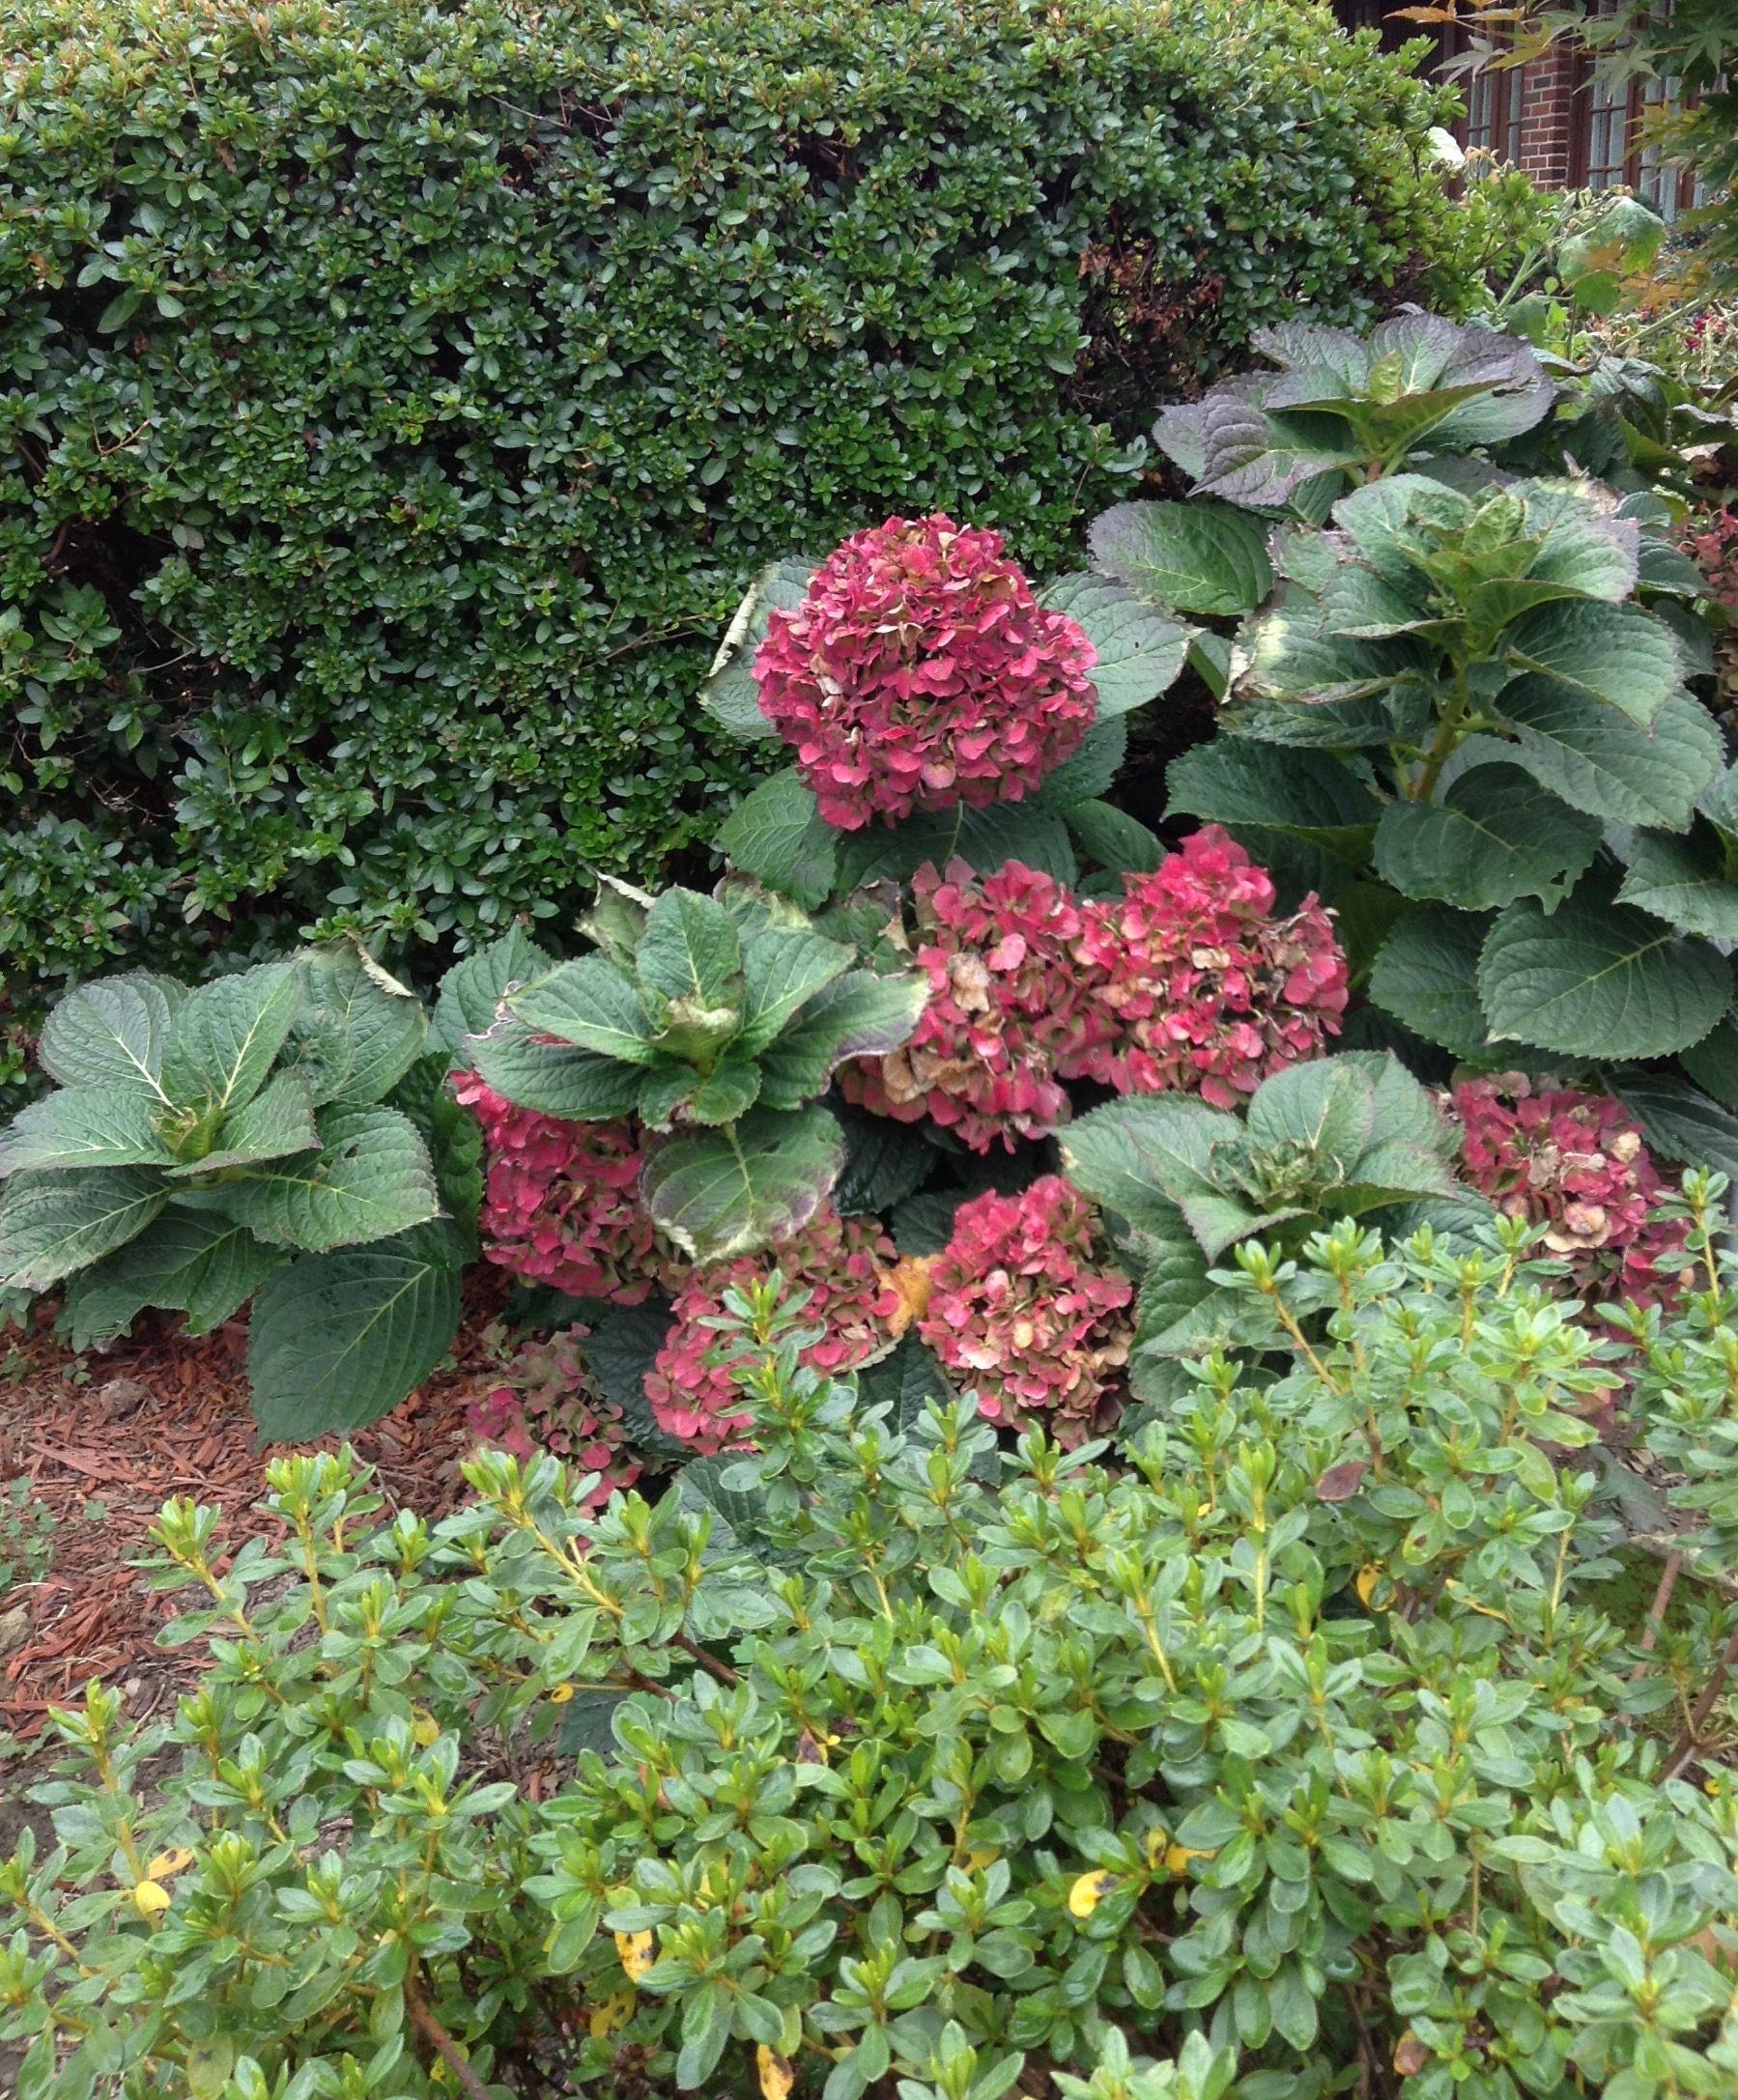 Pin By Valeria Kondratiev On Seasons Seasons Plants Garden